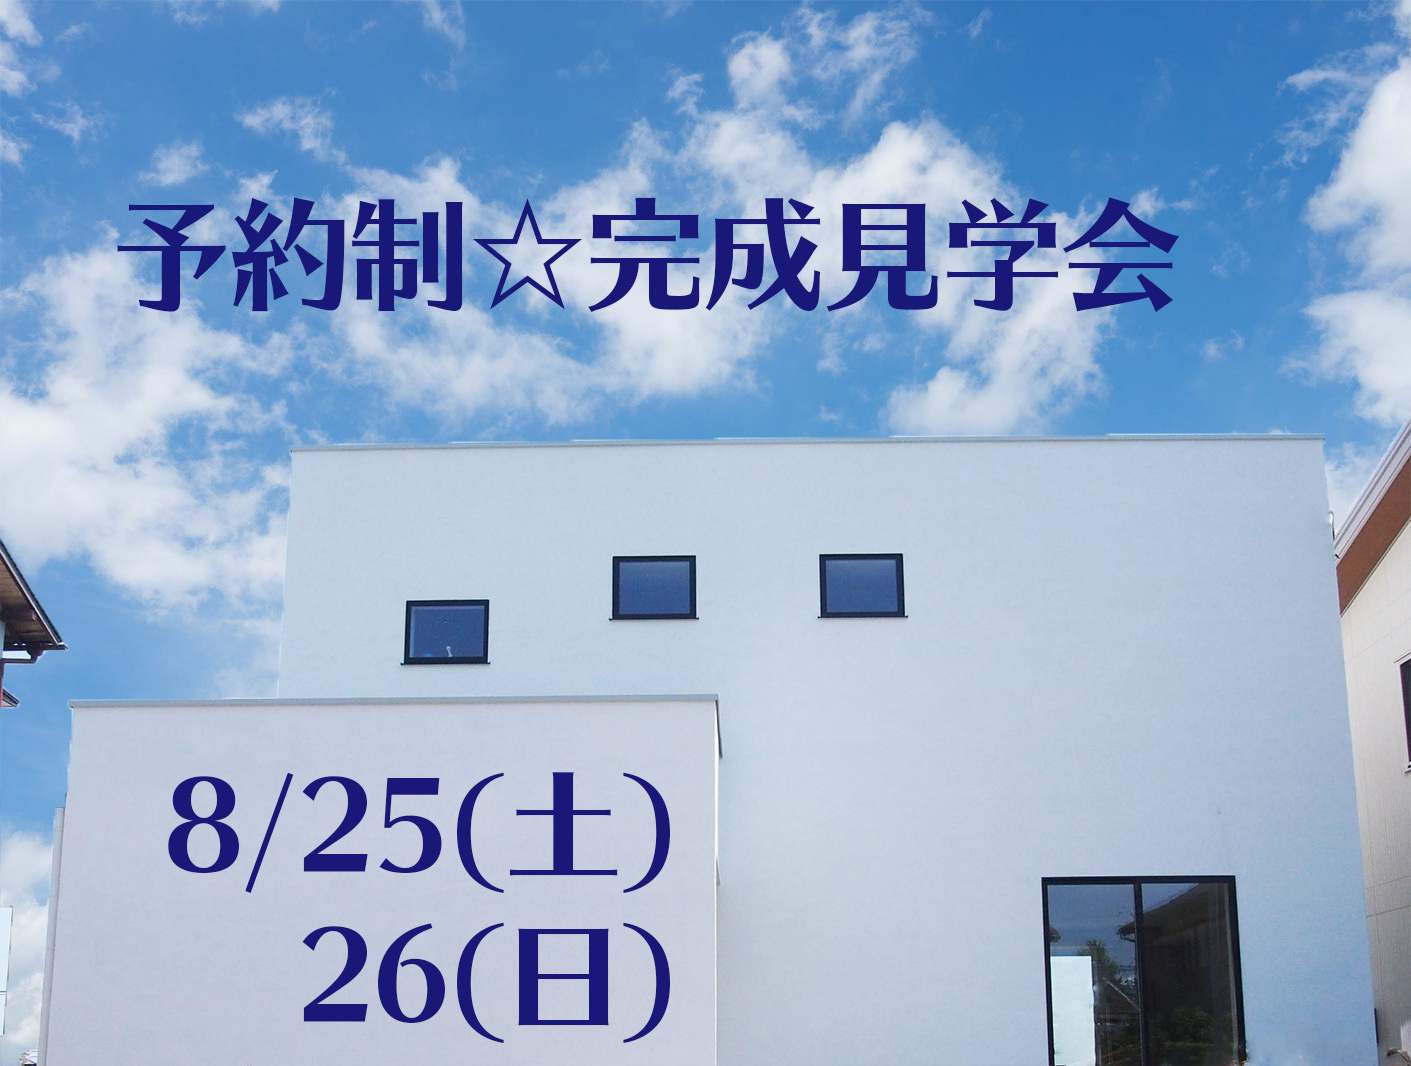 8/25sat,26sun:完成見学会開催!予約制でゆっくりご覧ください